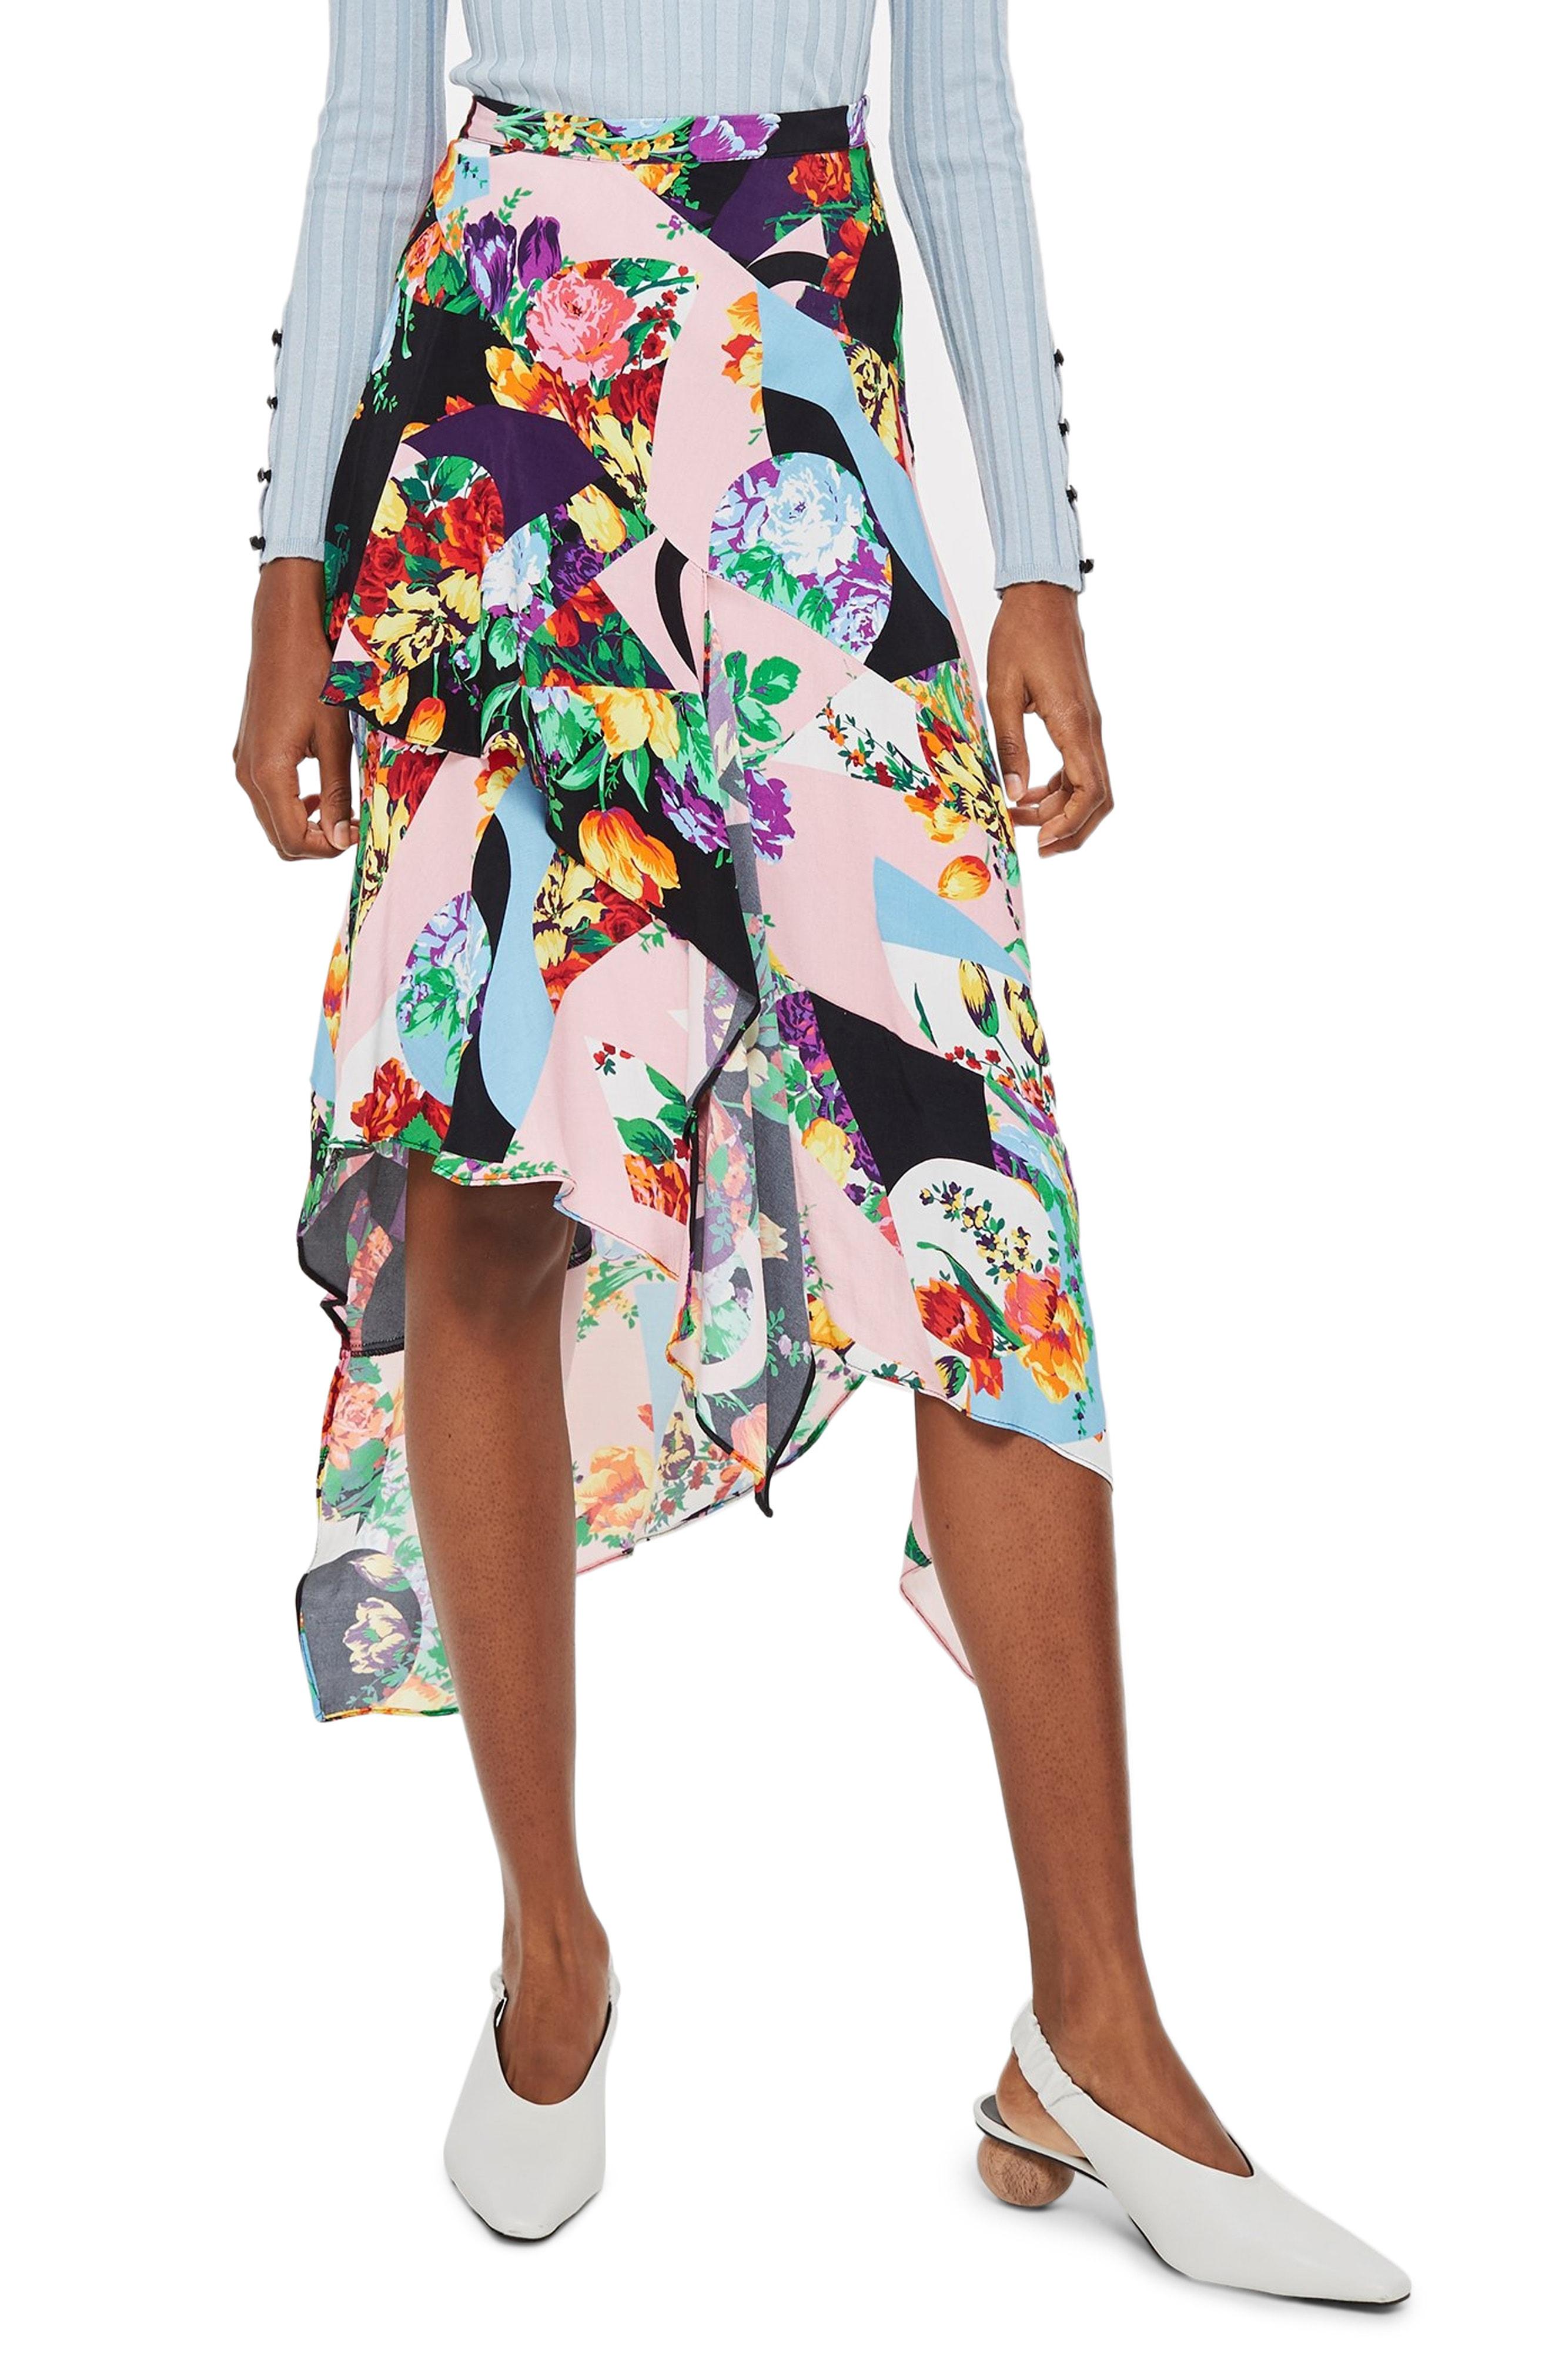 Topshop Spliced Floral Print Midi Skirt